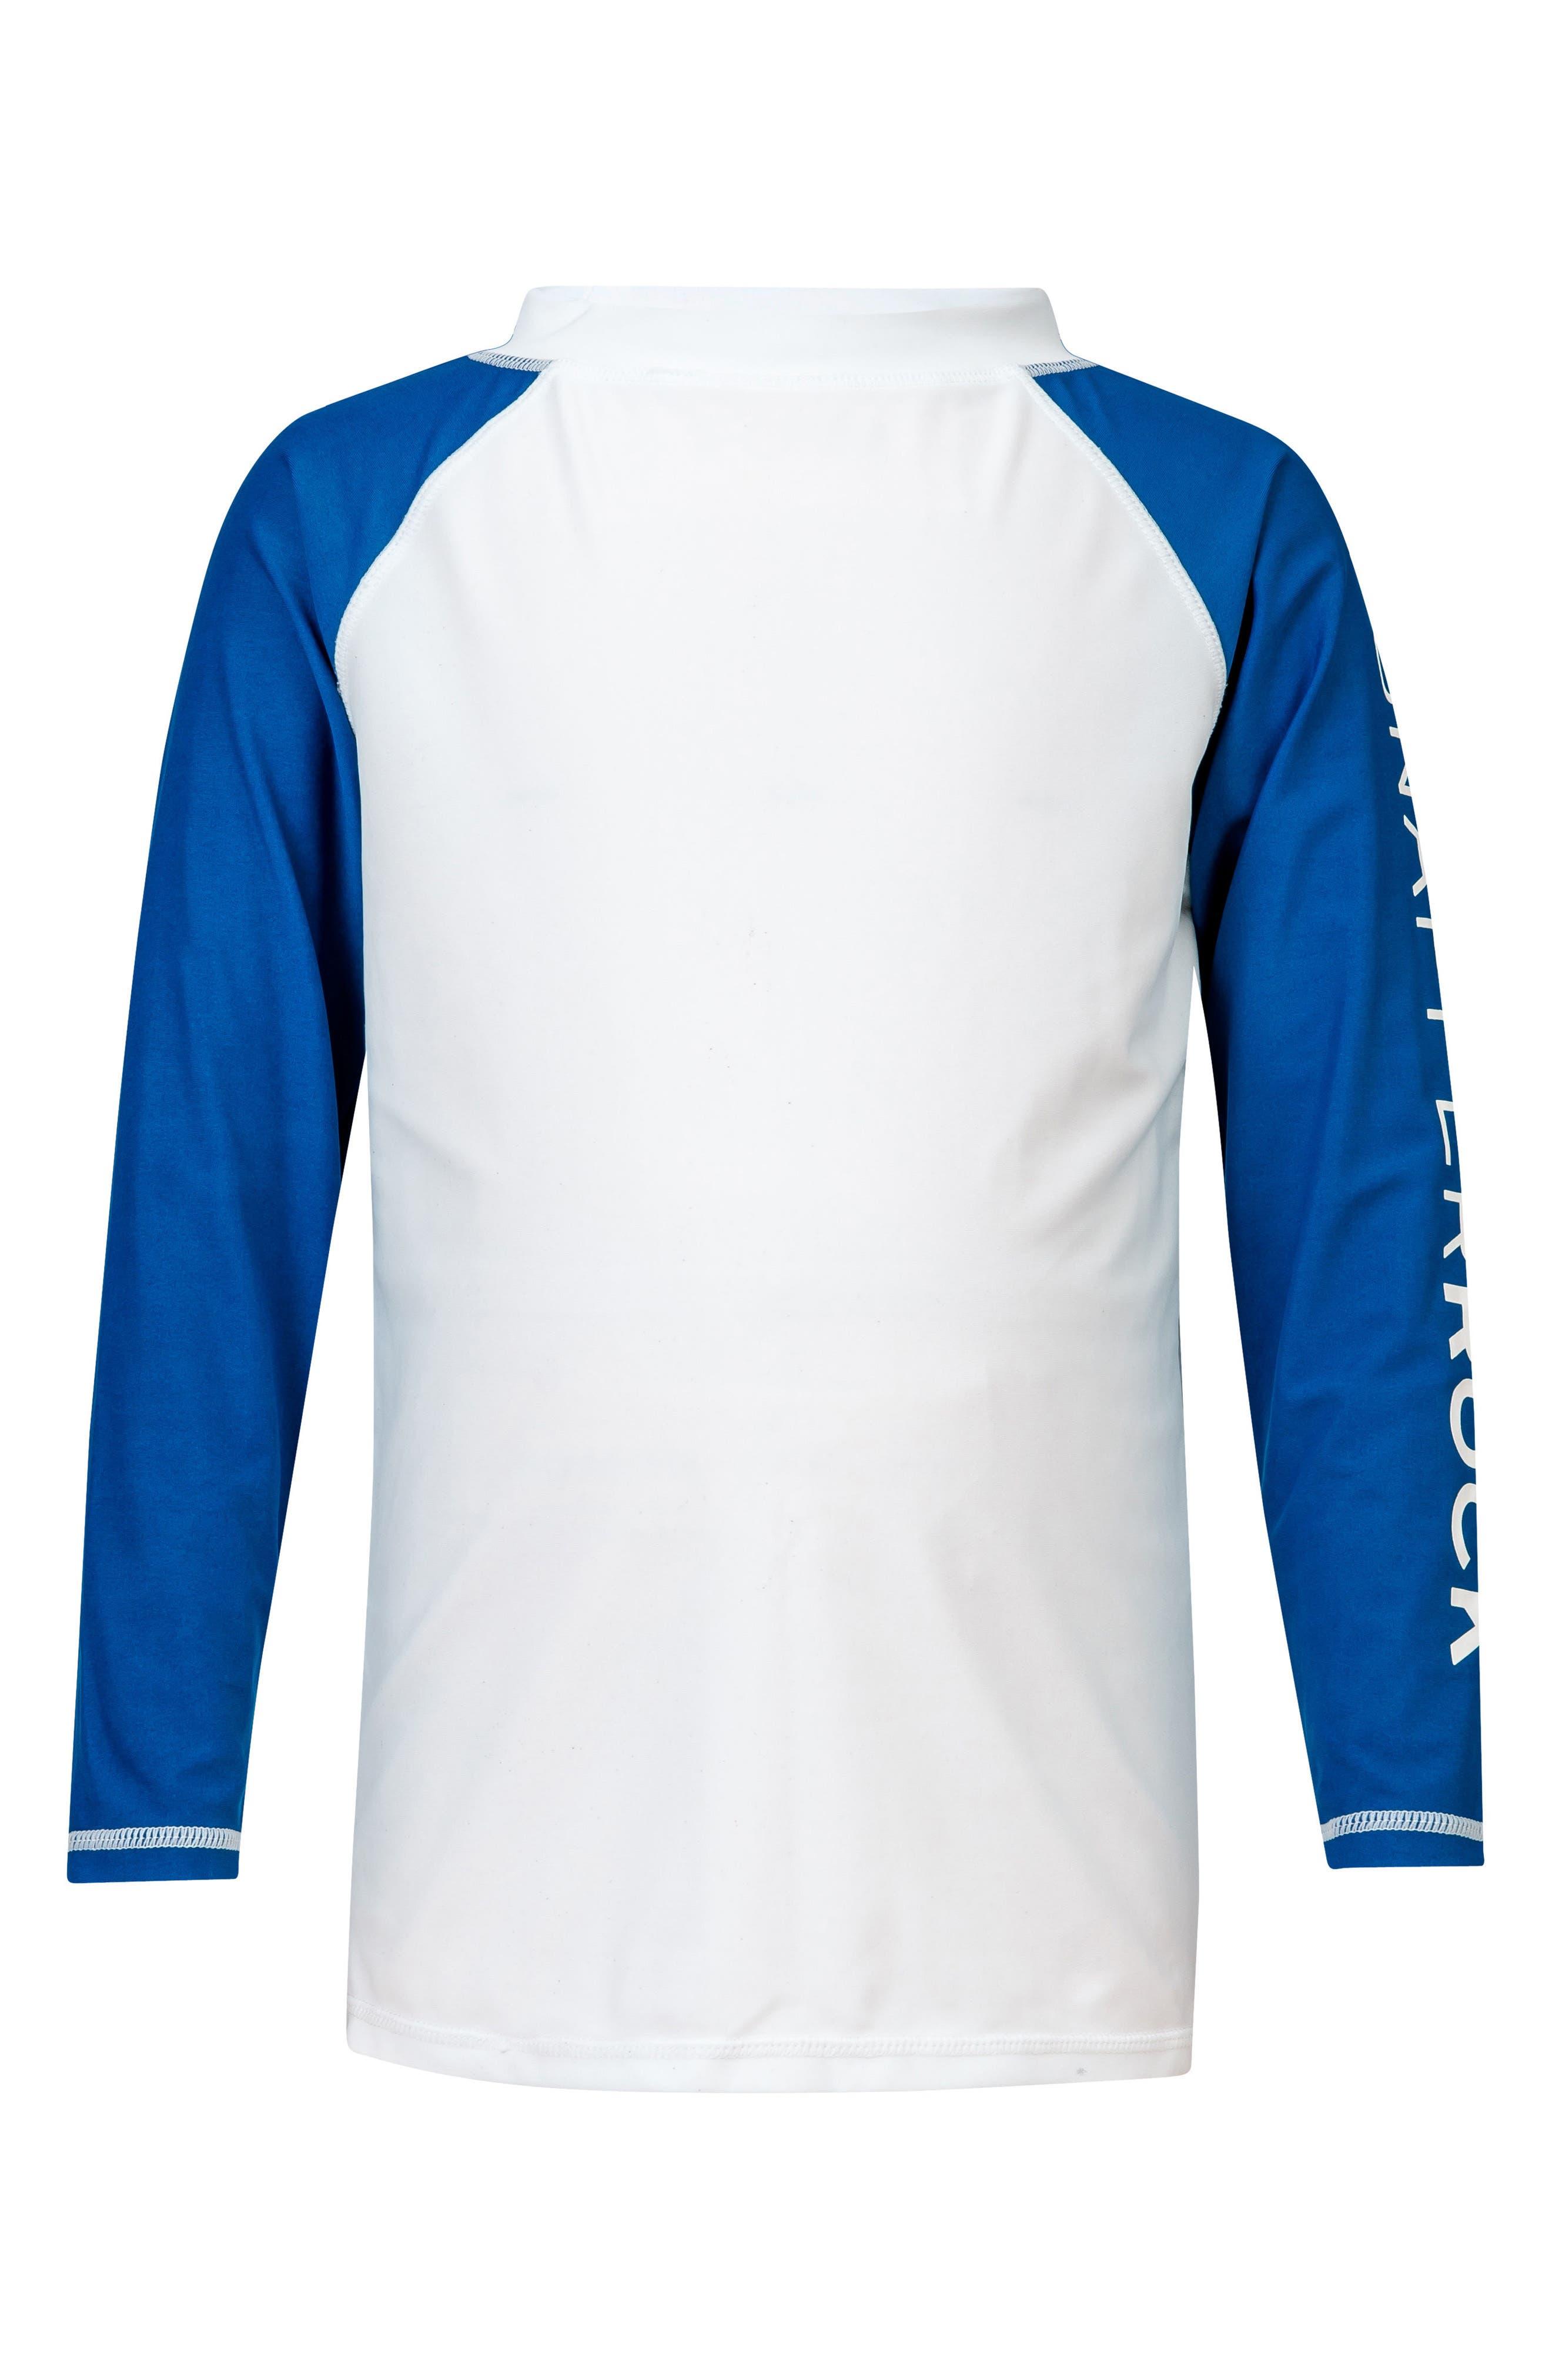 Contrast Long Sleeve Rashguard,                             Main thumbnail 1, color,                             White/ Blue